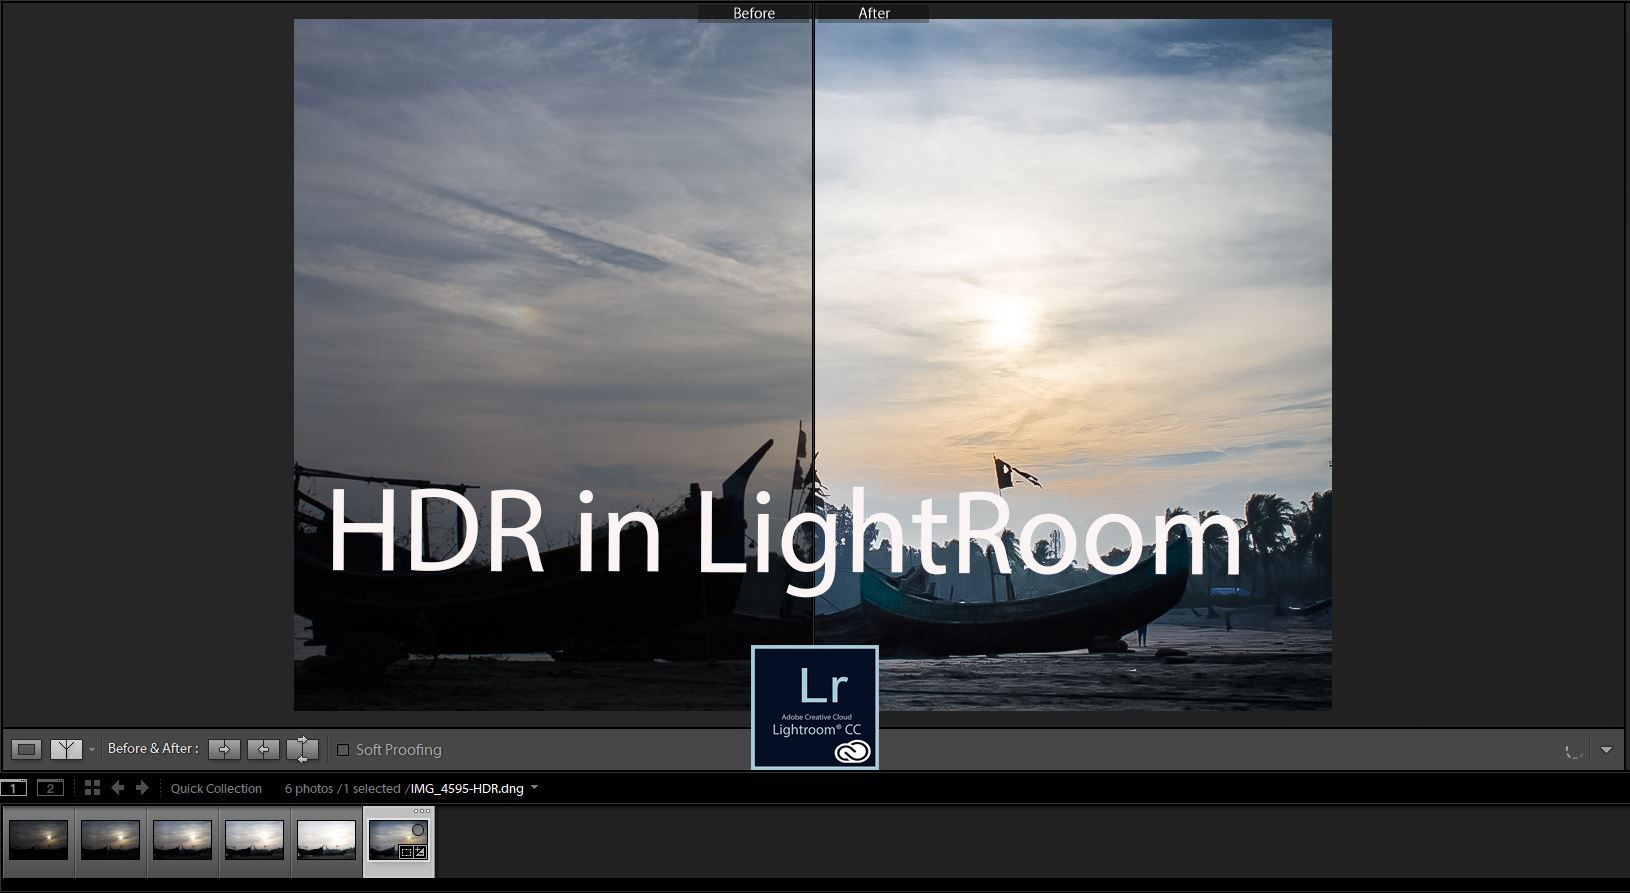 Lightroom cc watermark